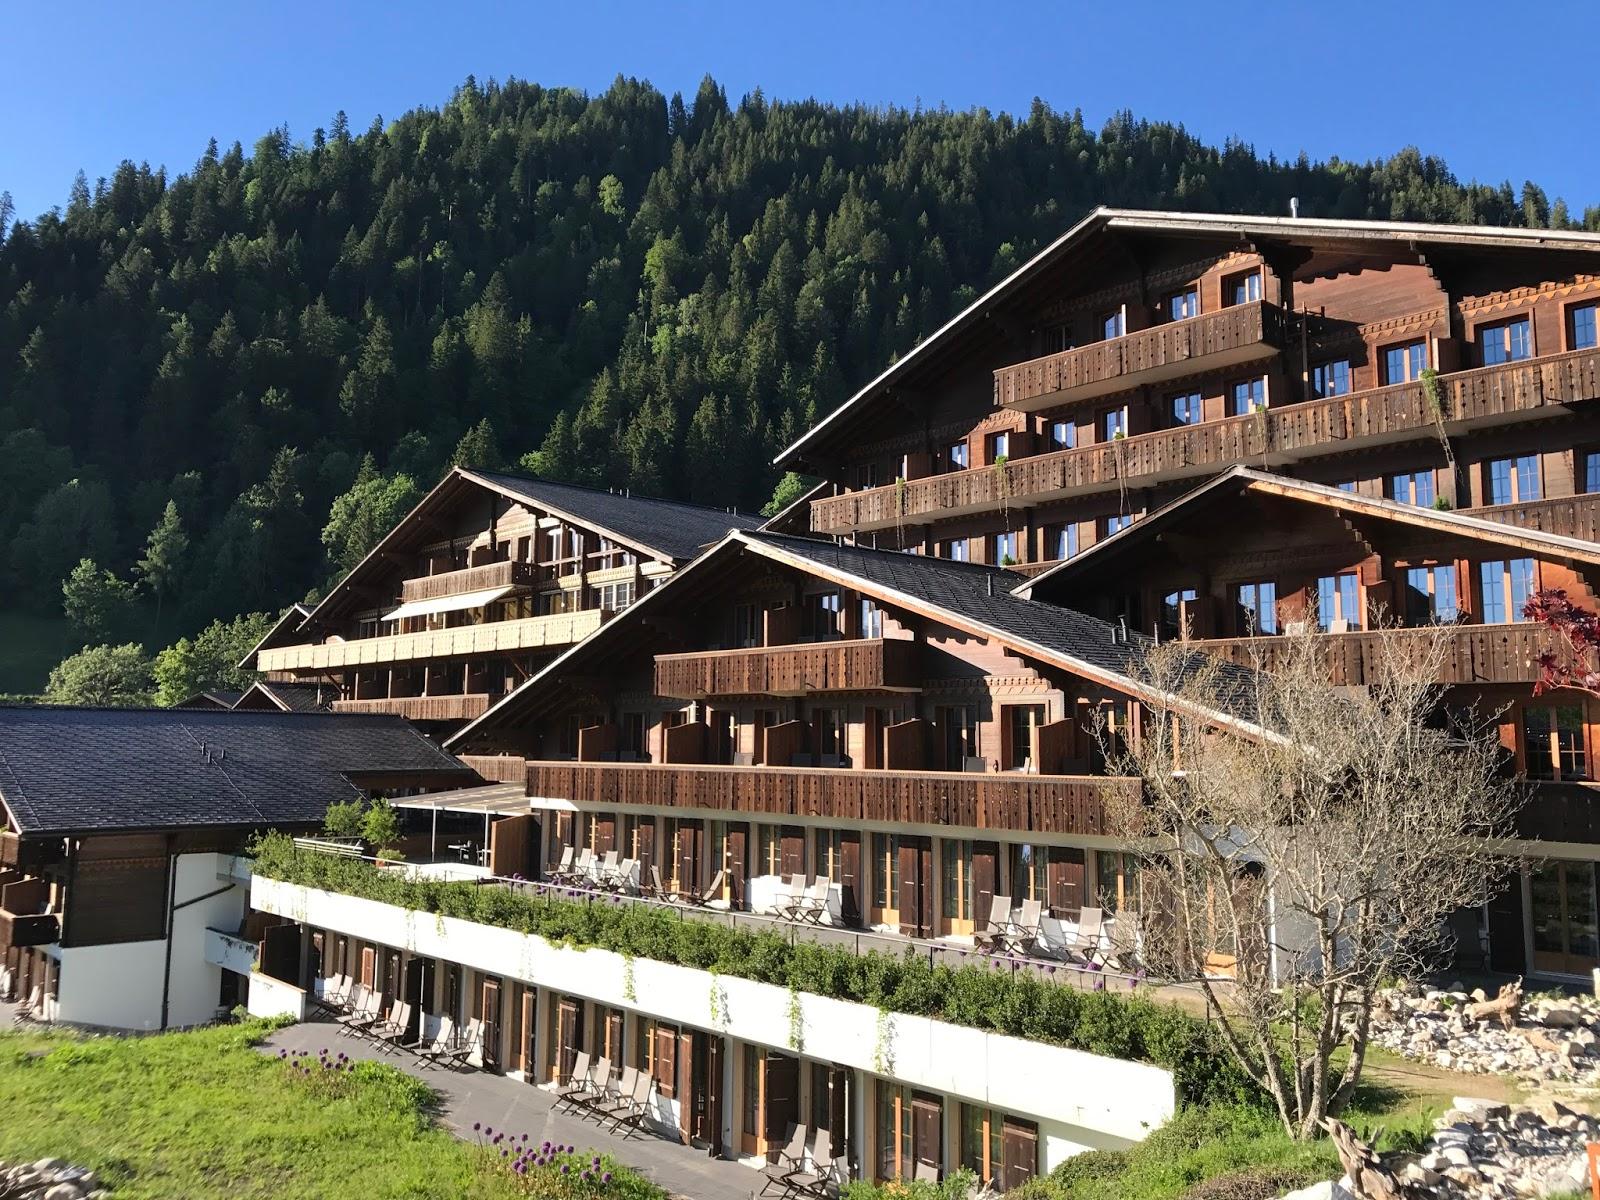 HUUS Hotel, Saanen-  Swedish cool in the Bernese Oberland, with a biking vibe